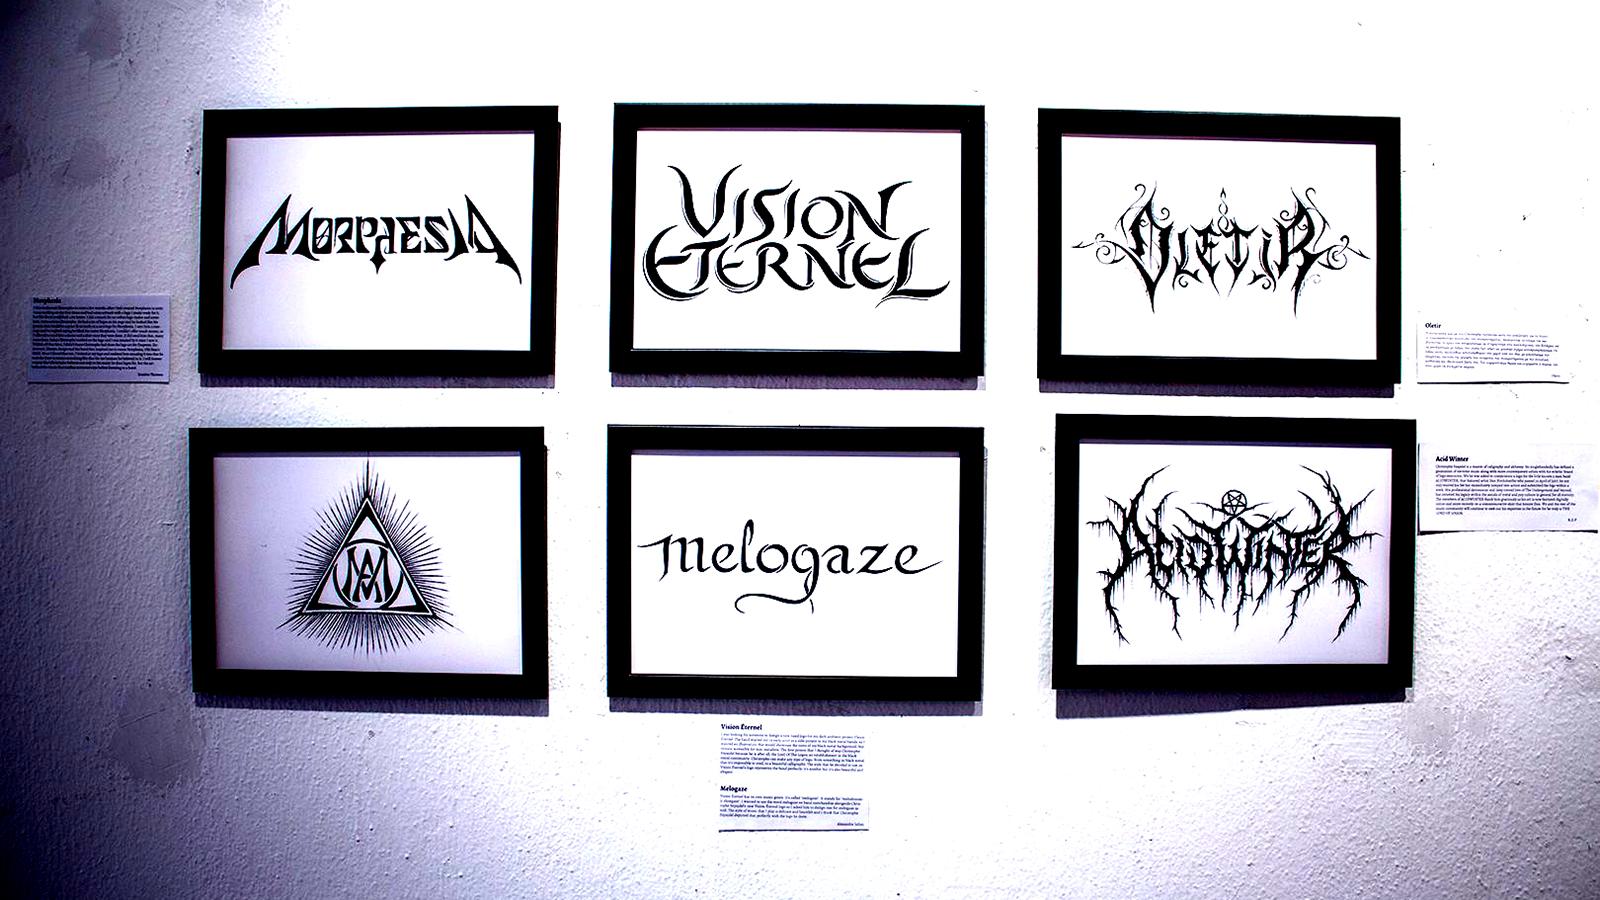 Vision Éternel Logo Displayed At Christophe Szpajdel's A Journey Into The Lost Homelands Exhibition